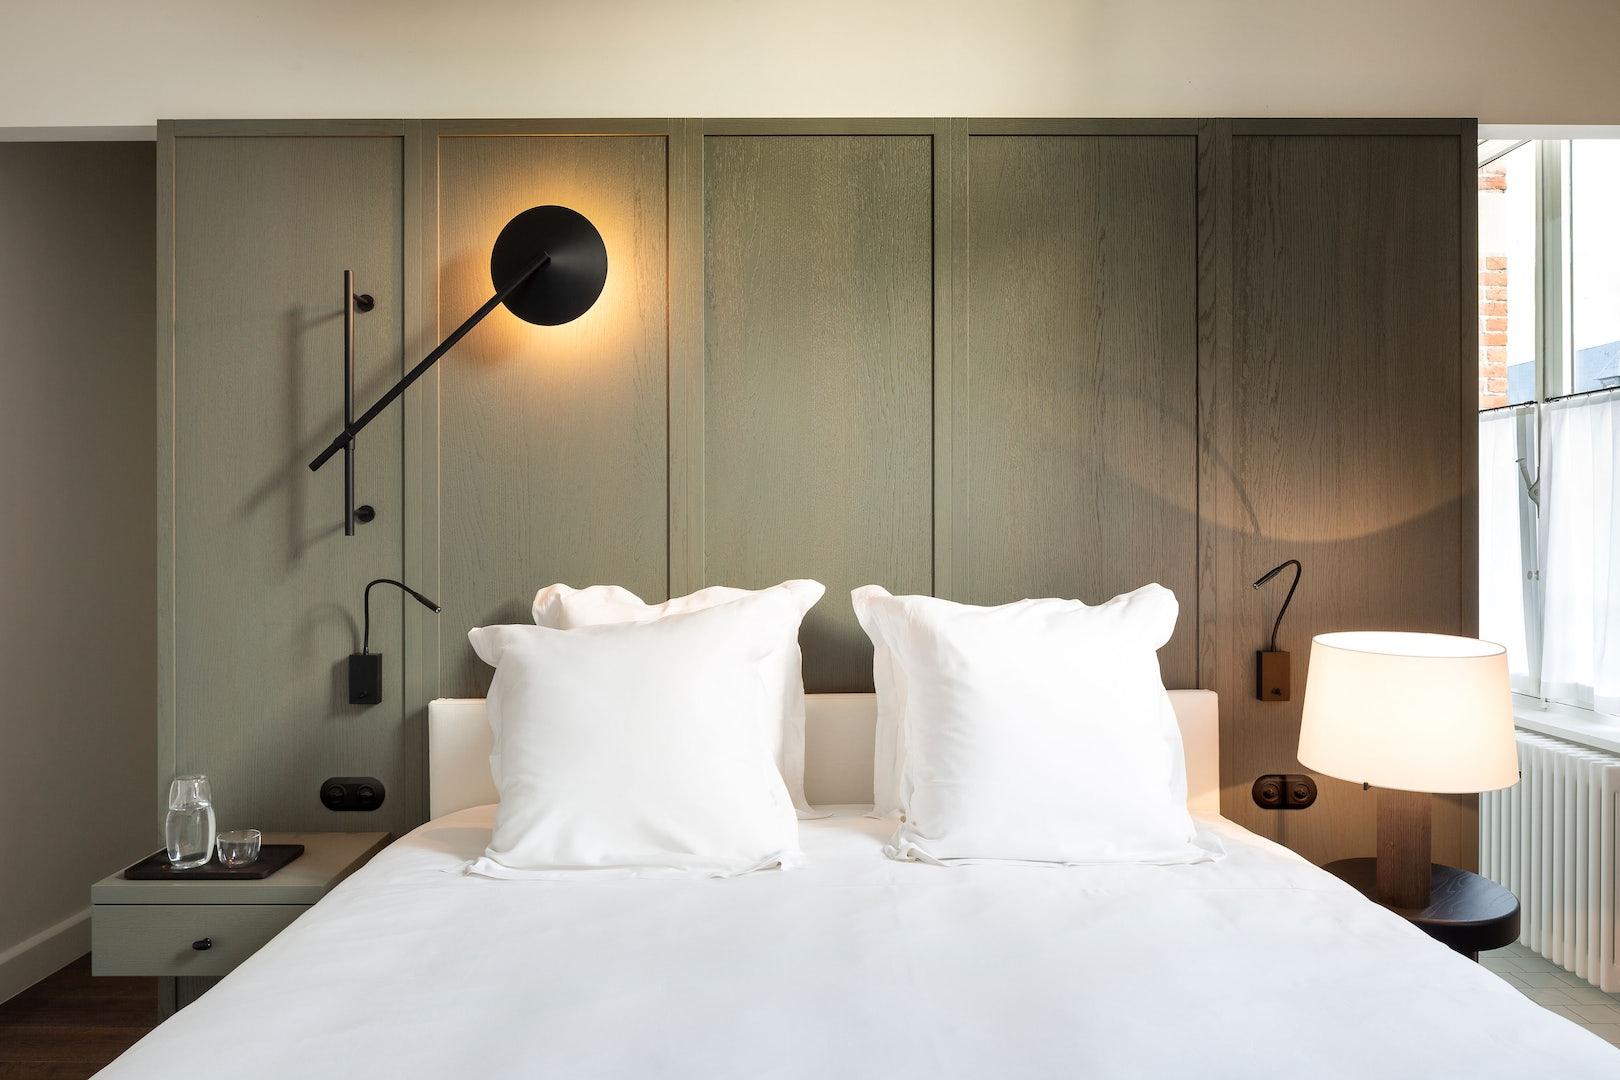 Antwerp - Hotel August - room interior